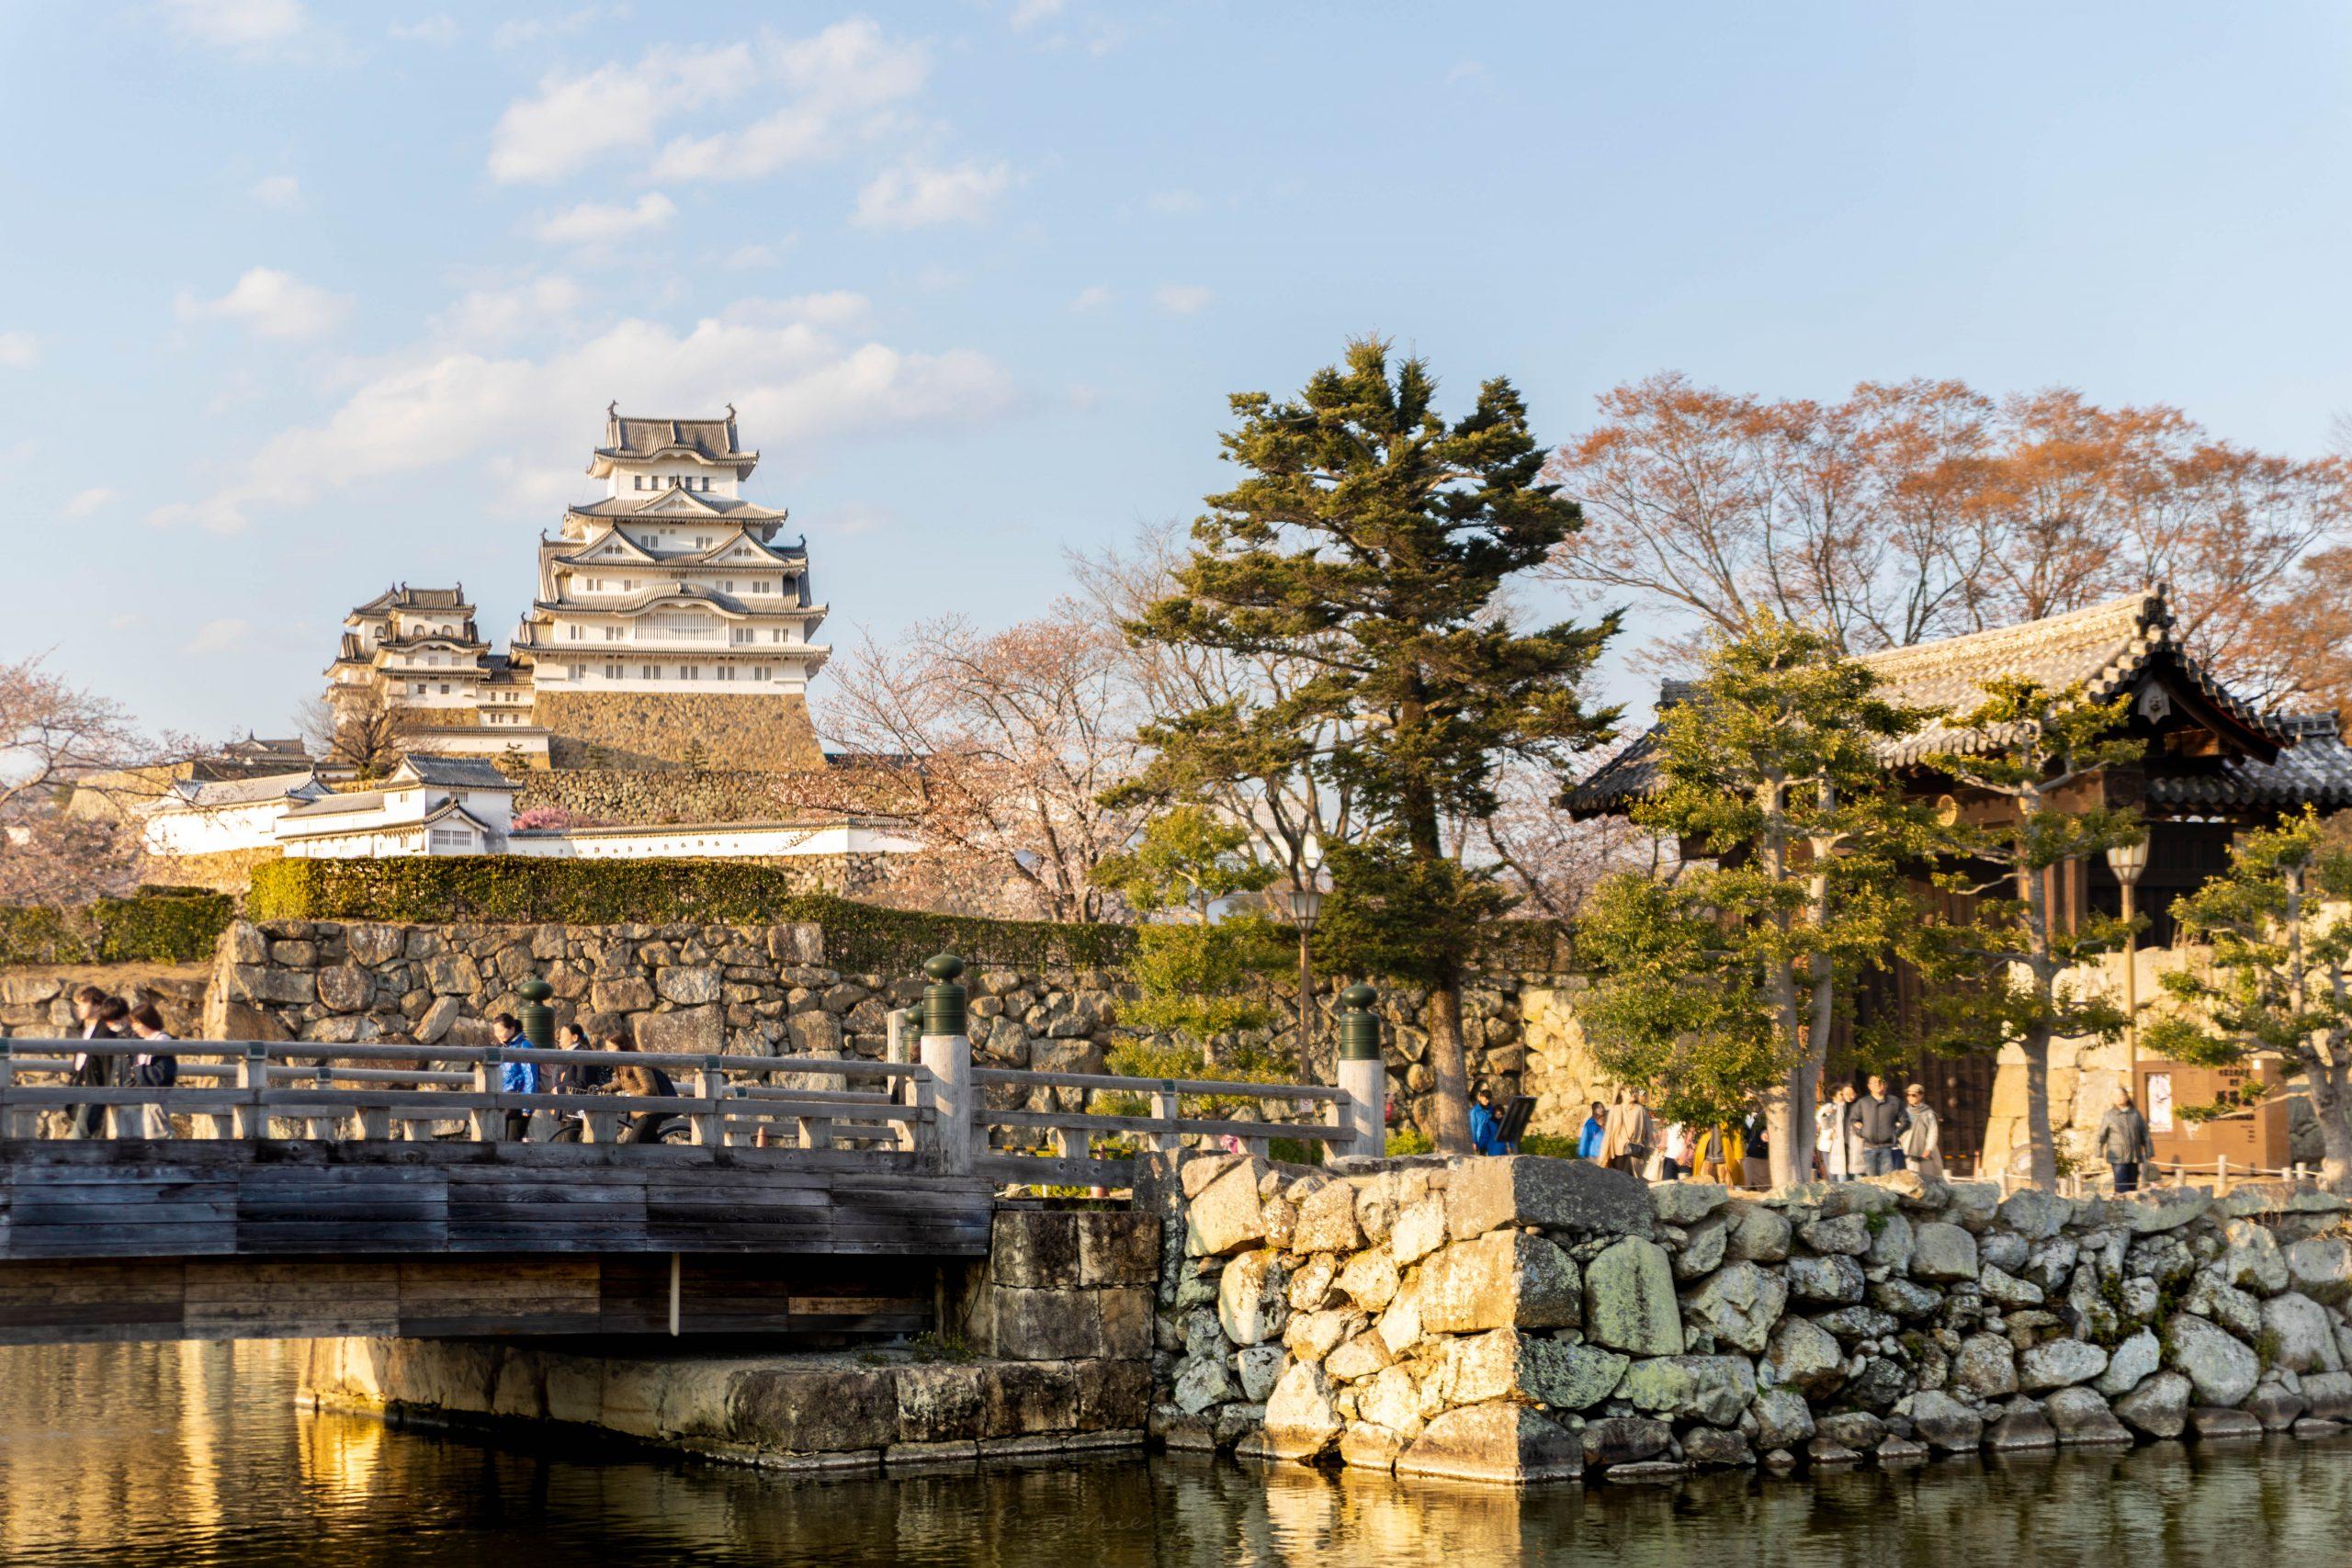 Himeji Castle Cherry Blossom Season in Hemeji Japan by @AnnieFairfax